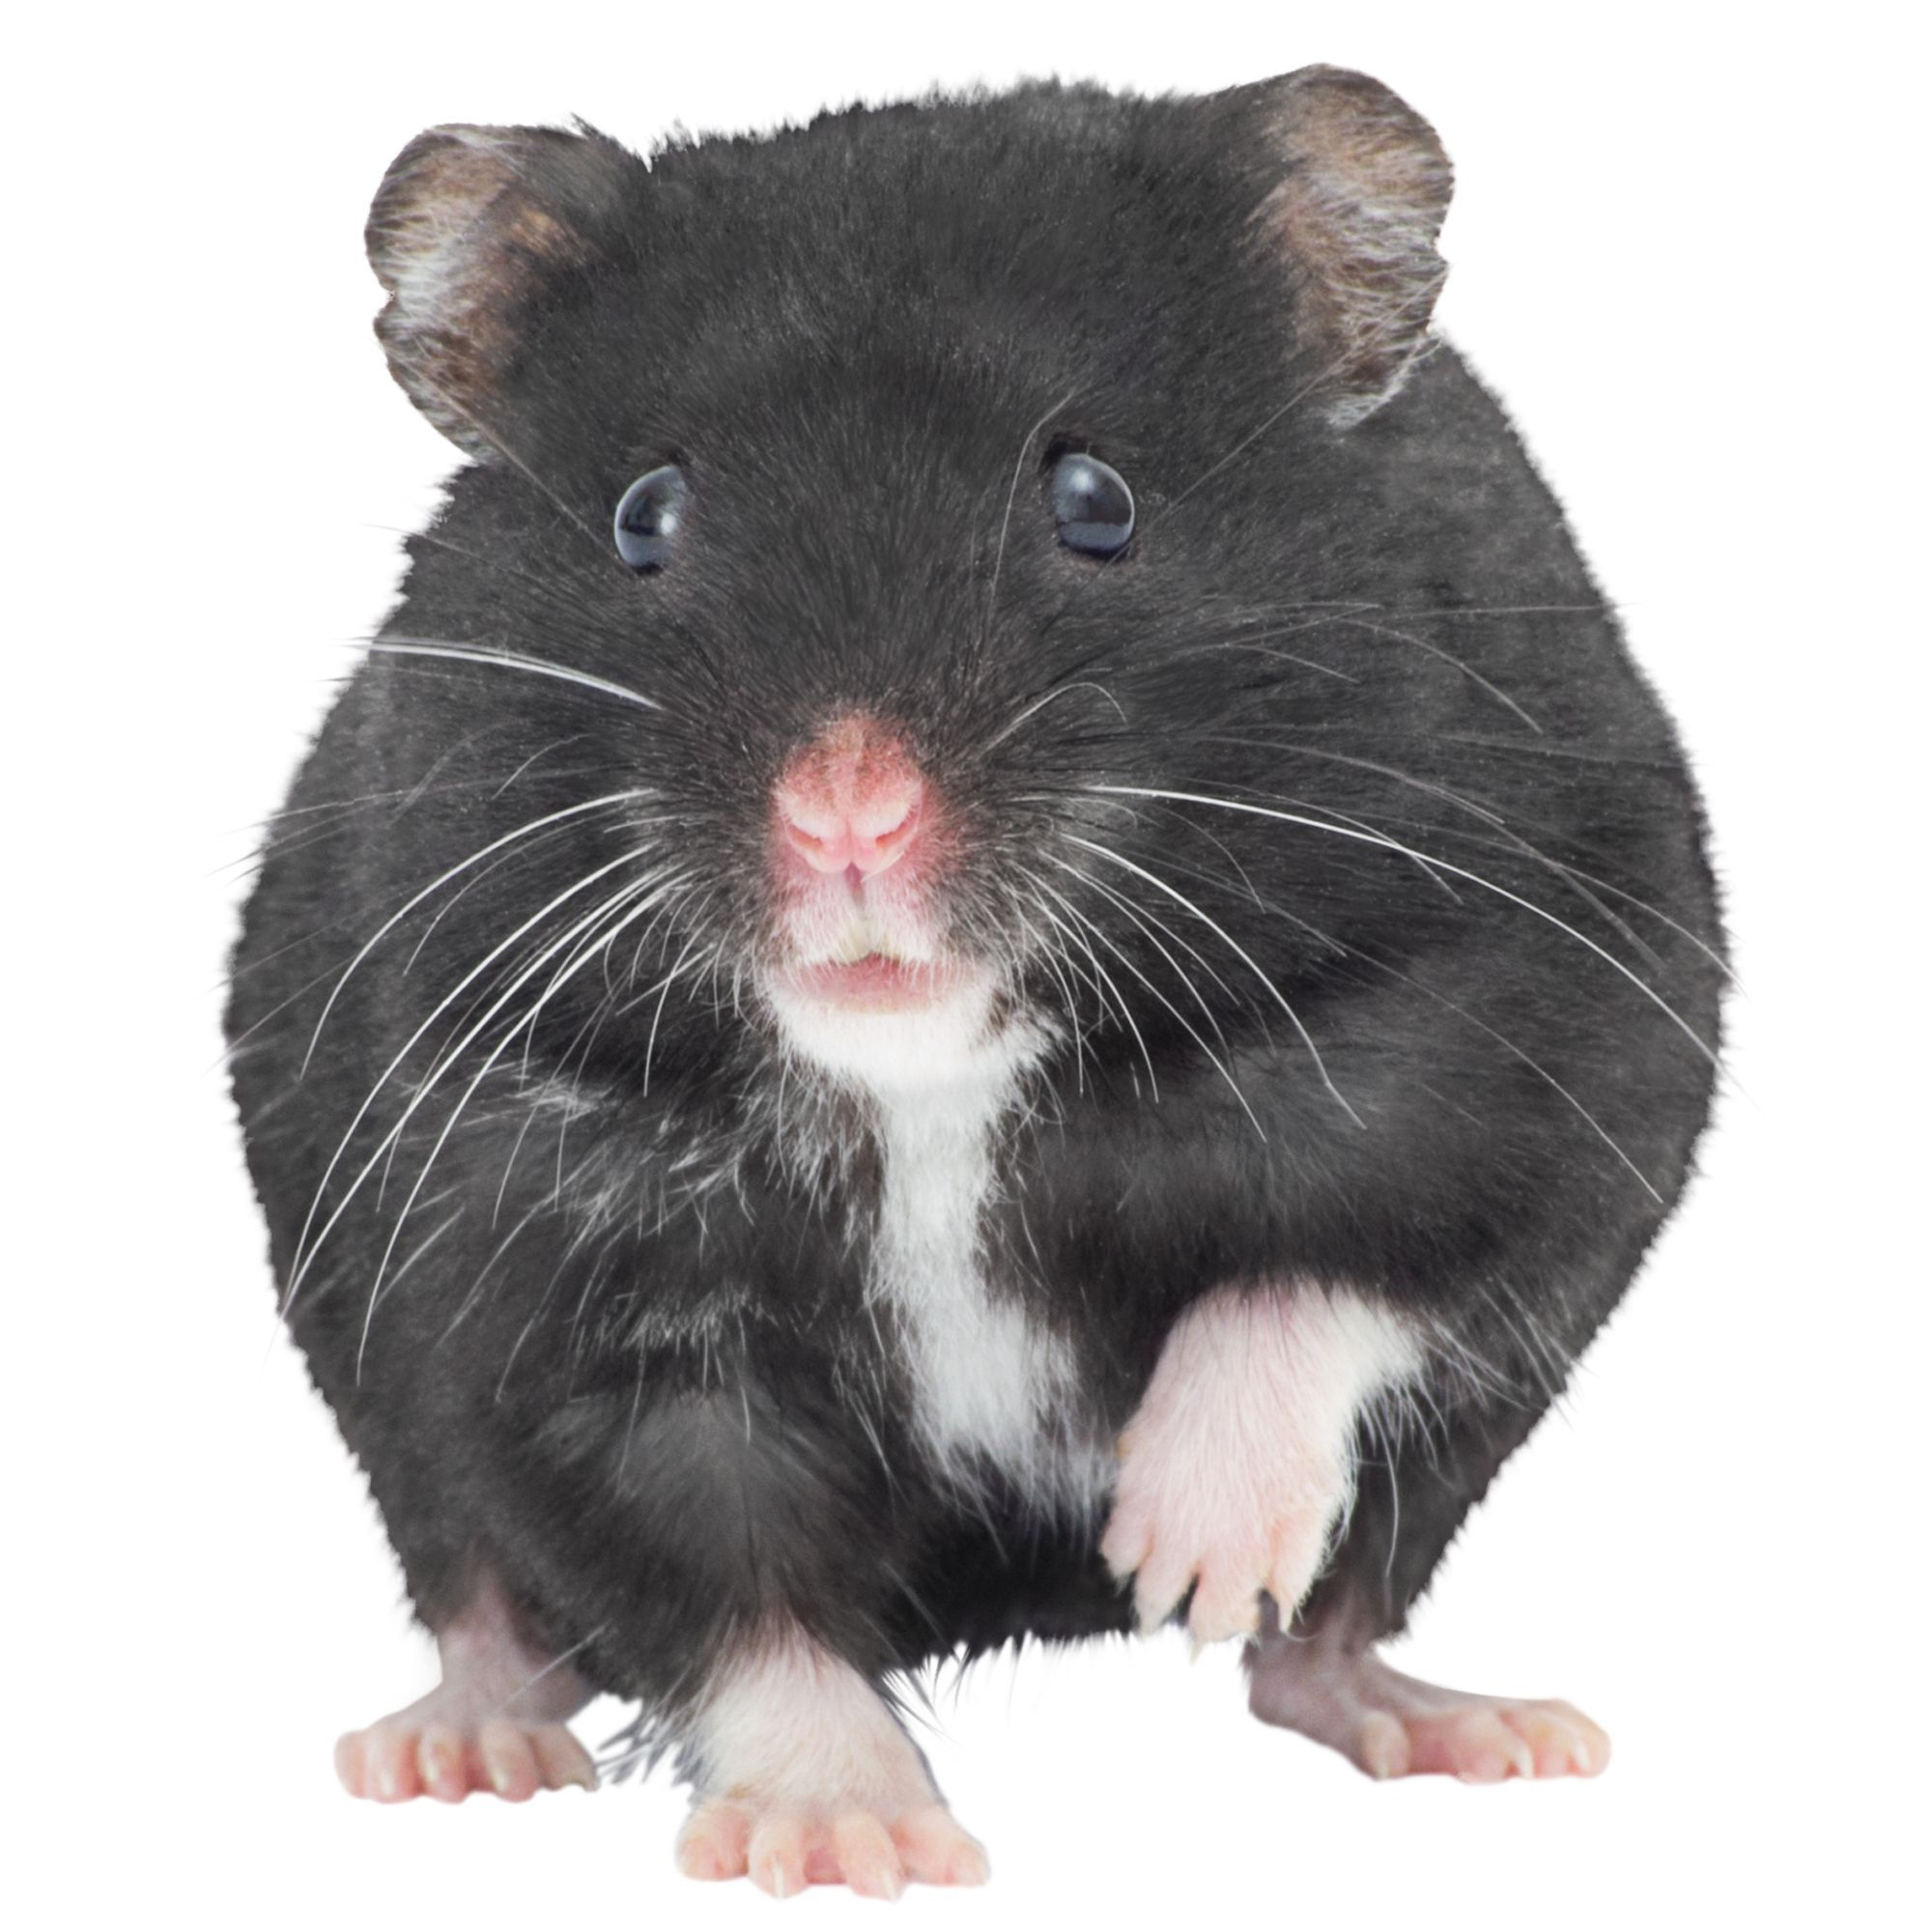 Russian Dwarf Hamster Russian dwarf hamster, Animals, Pets